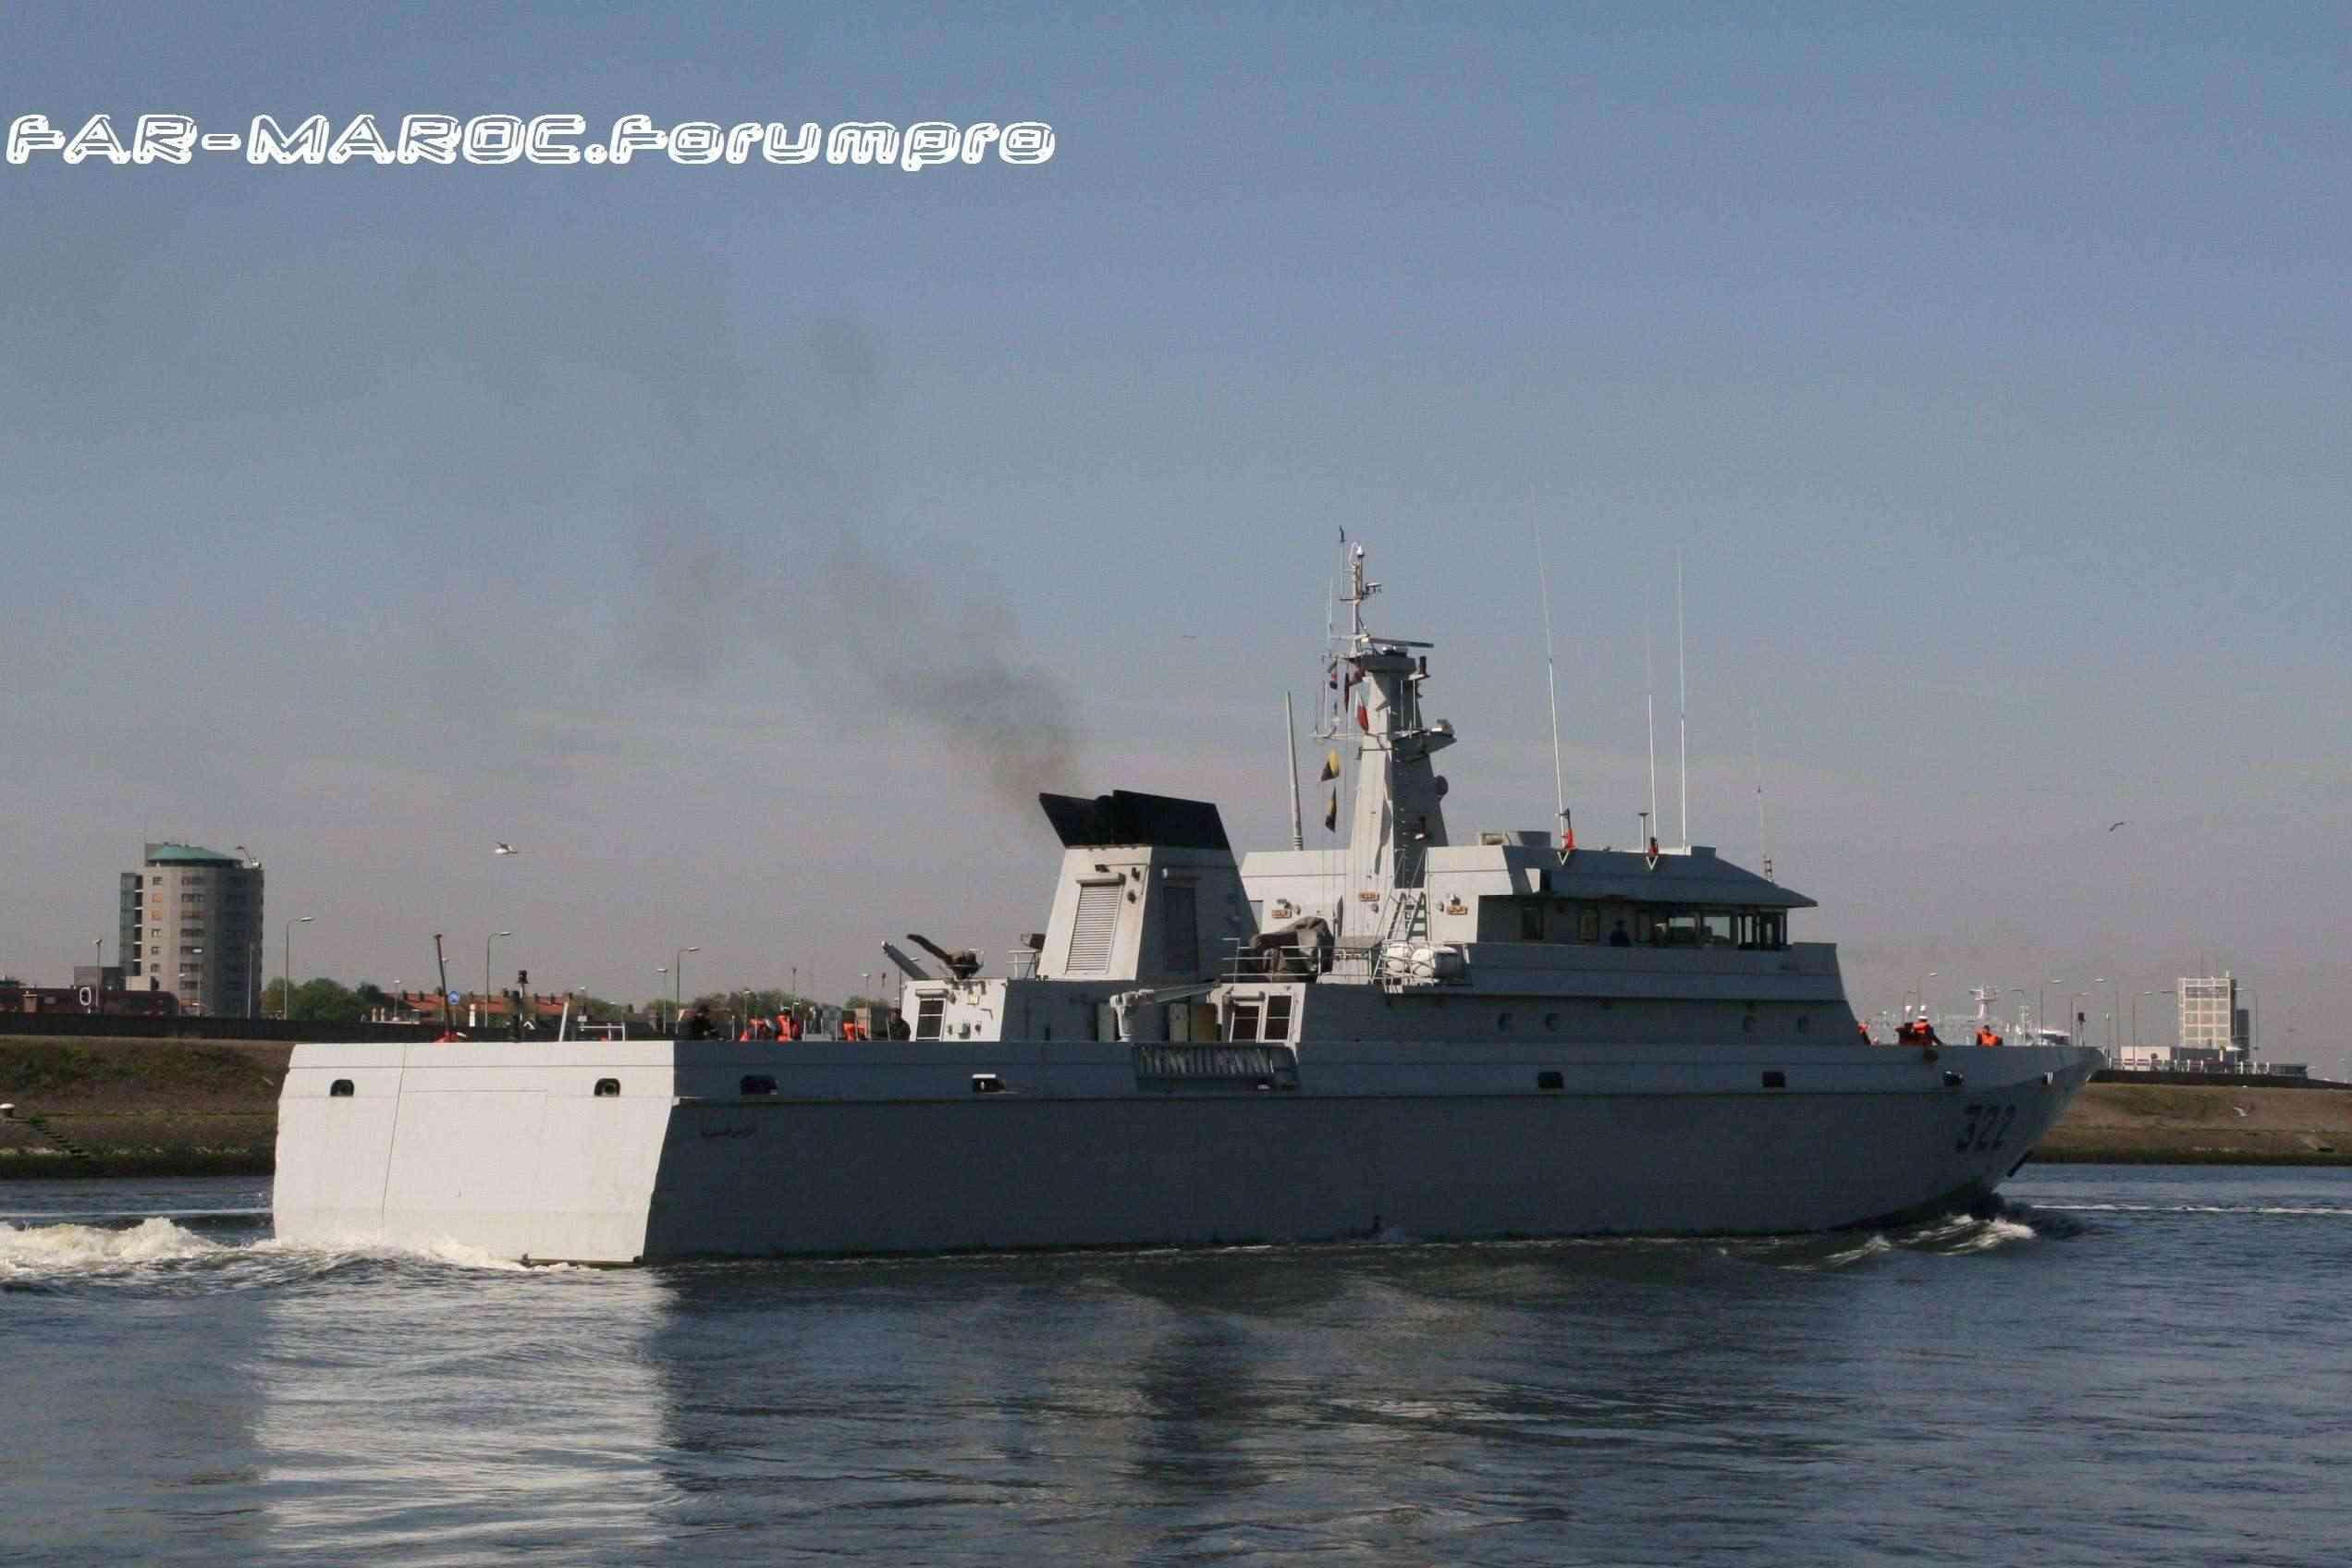 Royal Moroccan Navy Patrol Boats / Patrouilleurs de la Marine Marocaine - Page 2 Shipph14